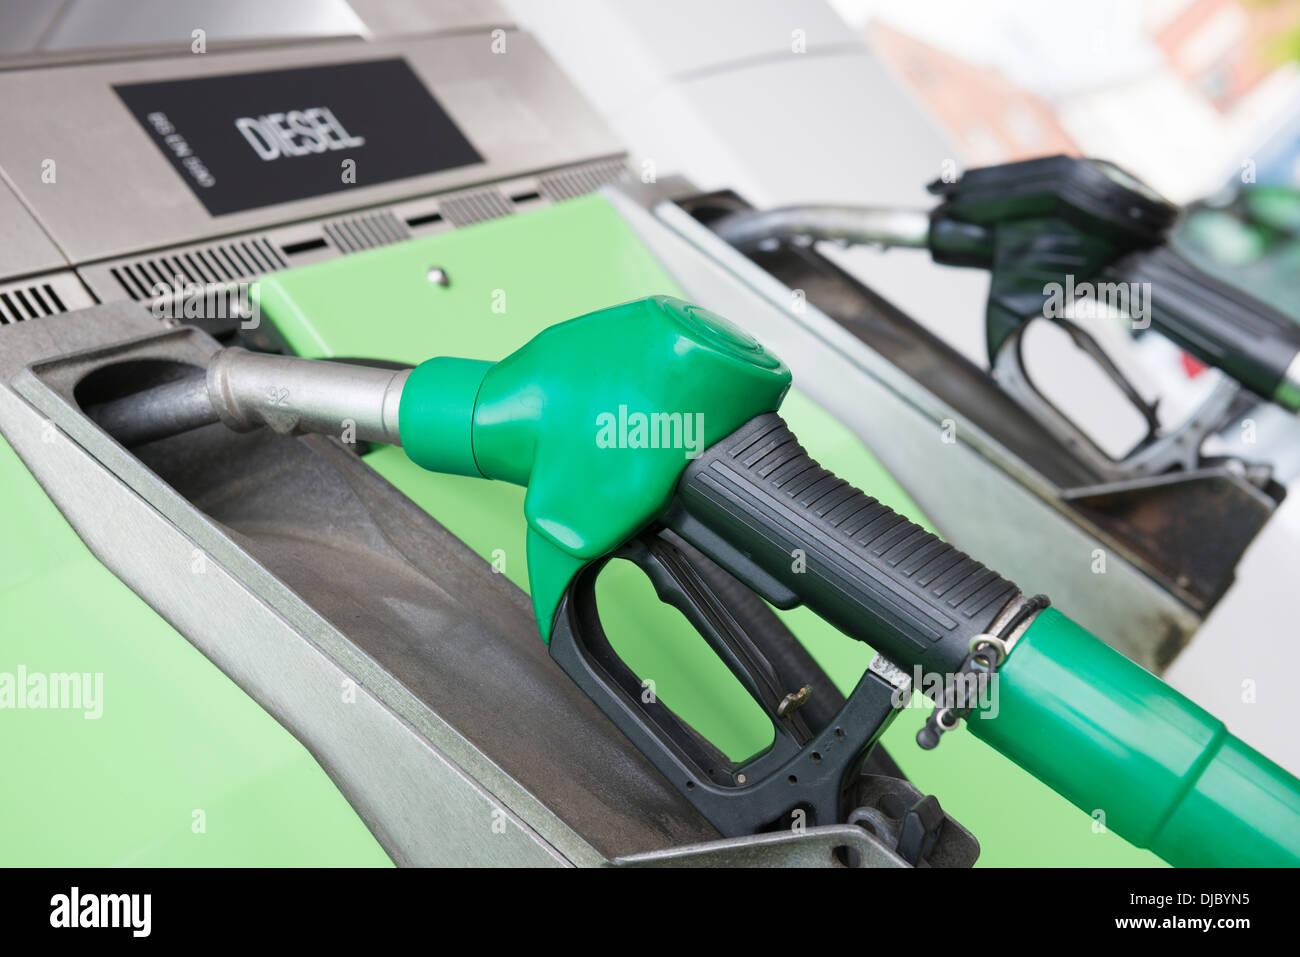 Petrol pumps - Stock Image